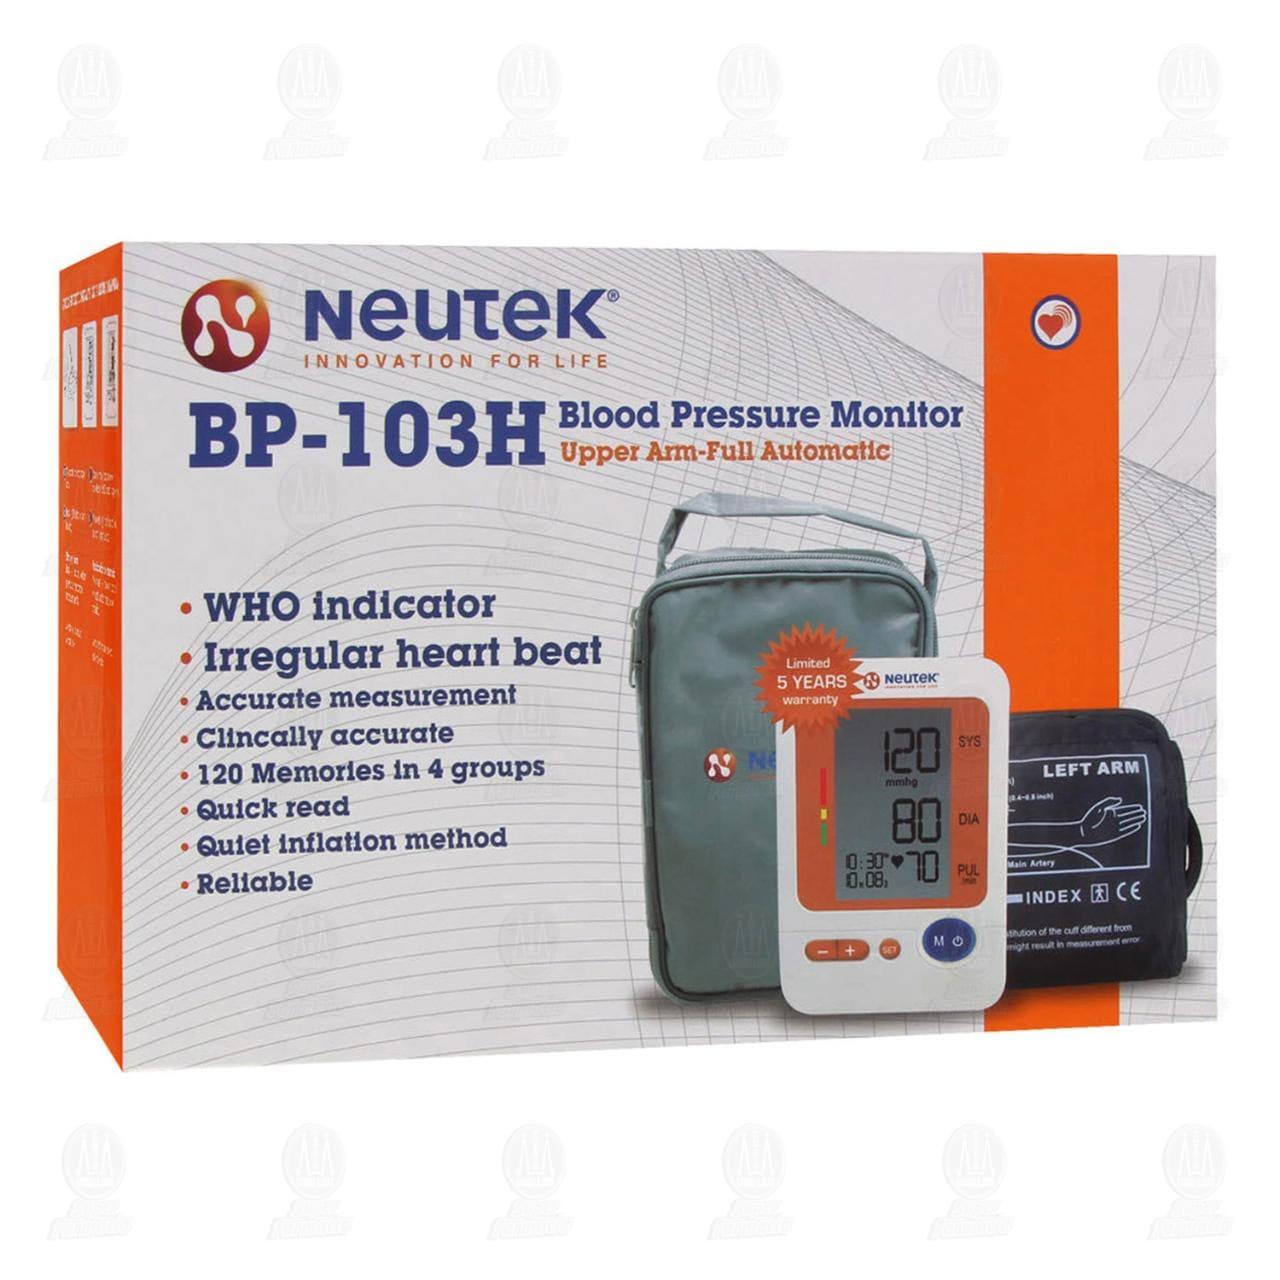 Comprar Monitor Neutek de Presión Sanguínea Brazo Digital en Farmacias Guadalajara